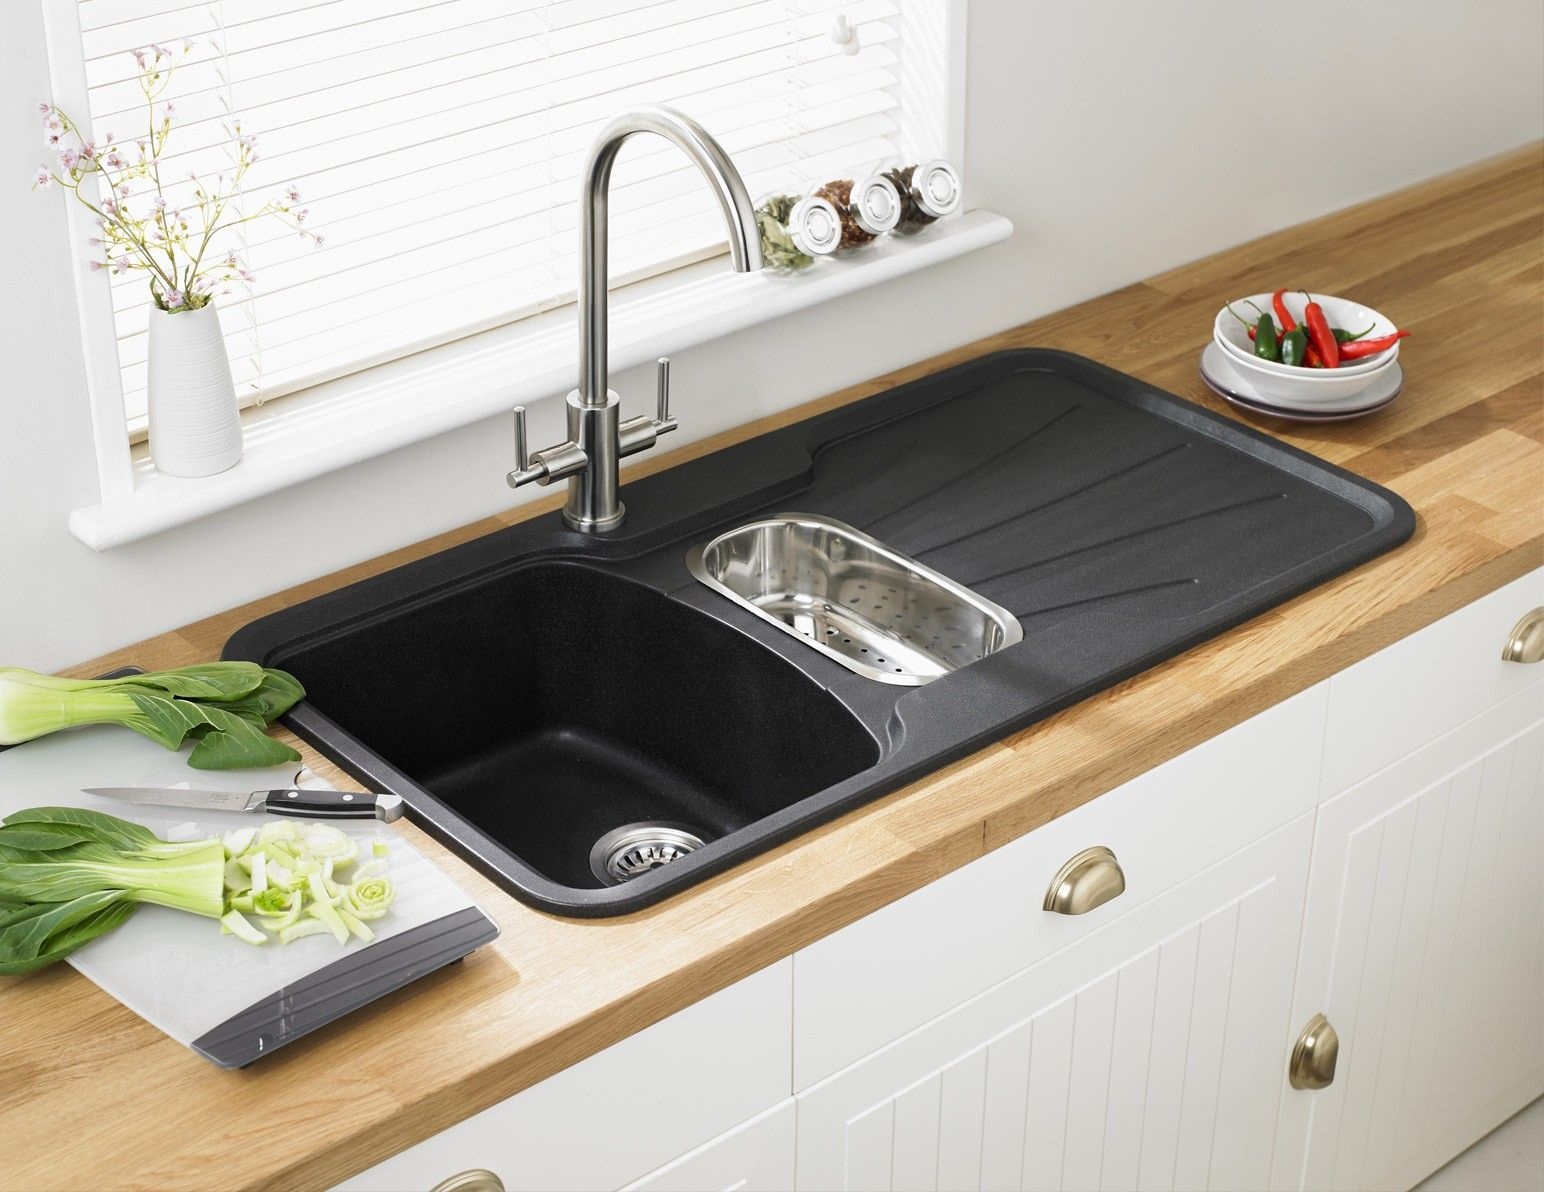 Korona 1 5 Bowl Composite Kitchen Sink By Astracast Best Kitchen Sinks Composite Kitchen Sinks Kitchen Sink Drainboard